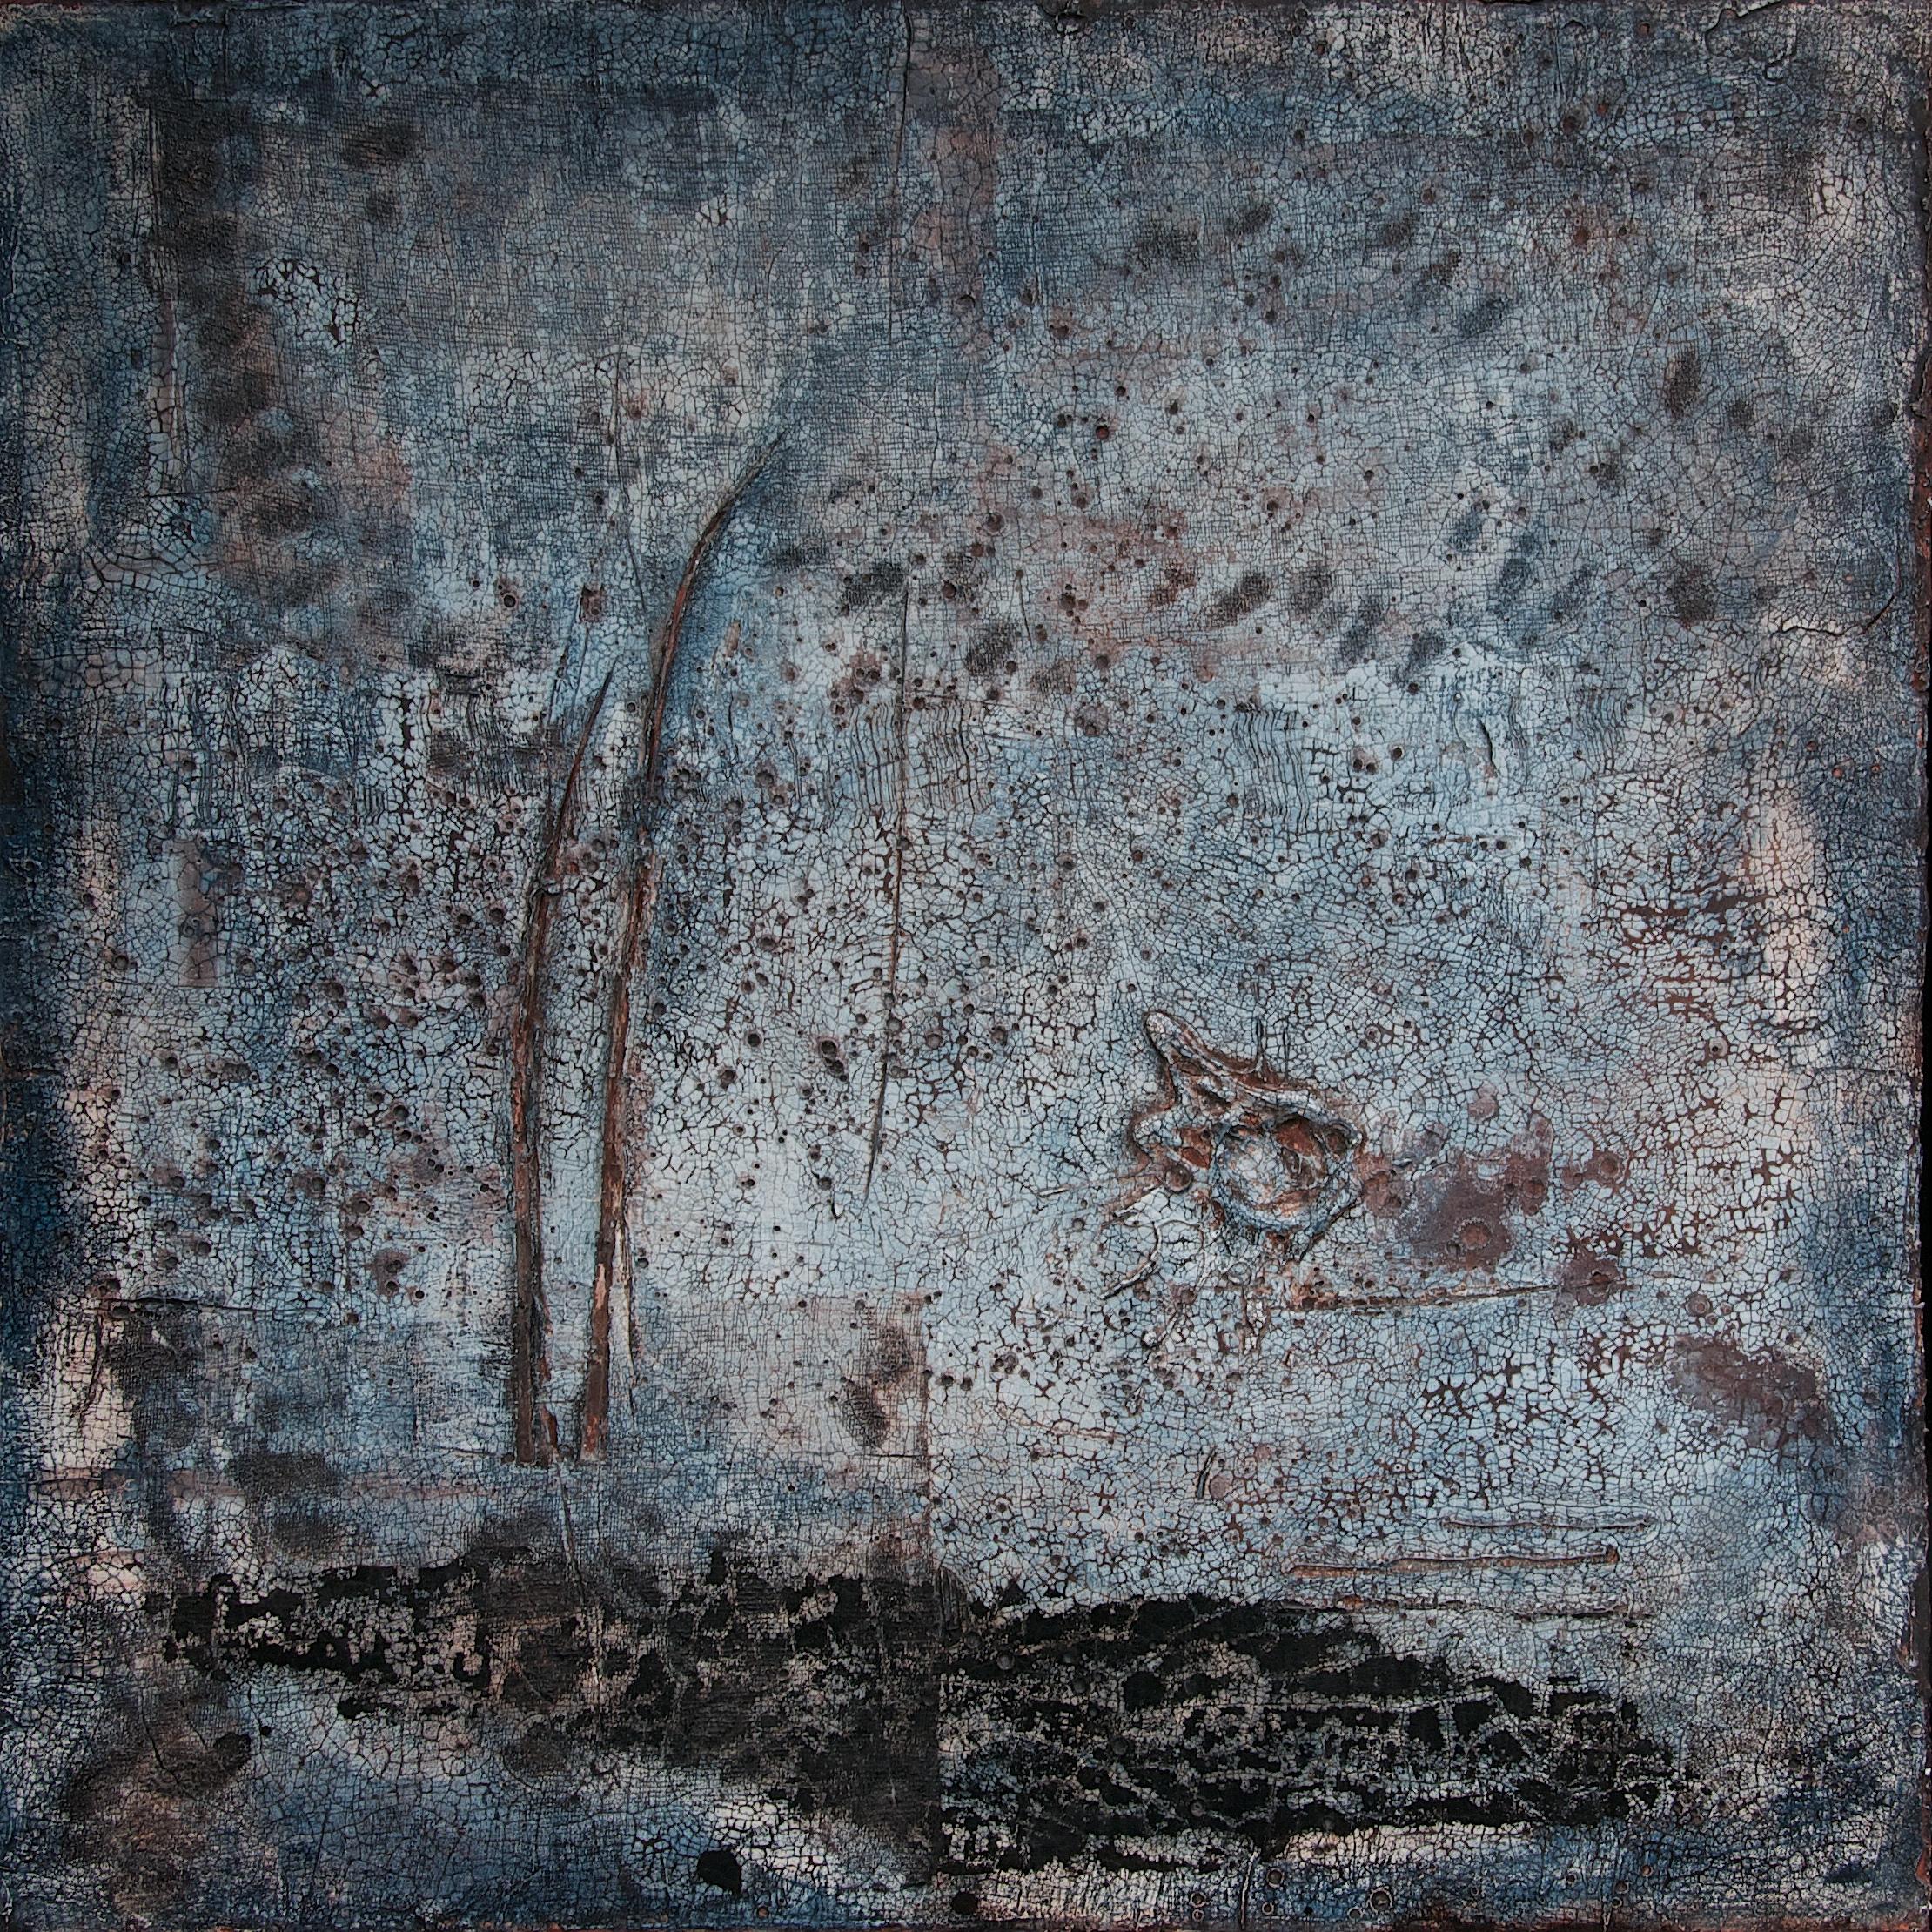 Fresko/Intonaco_ Sumpfkalk_Pigmente_Tusche_Beize_Schellack_Bauplatte_60 x 60 cm